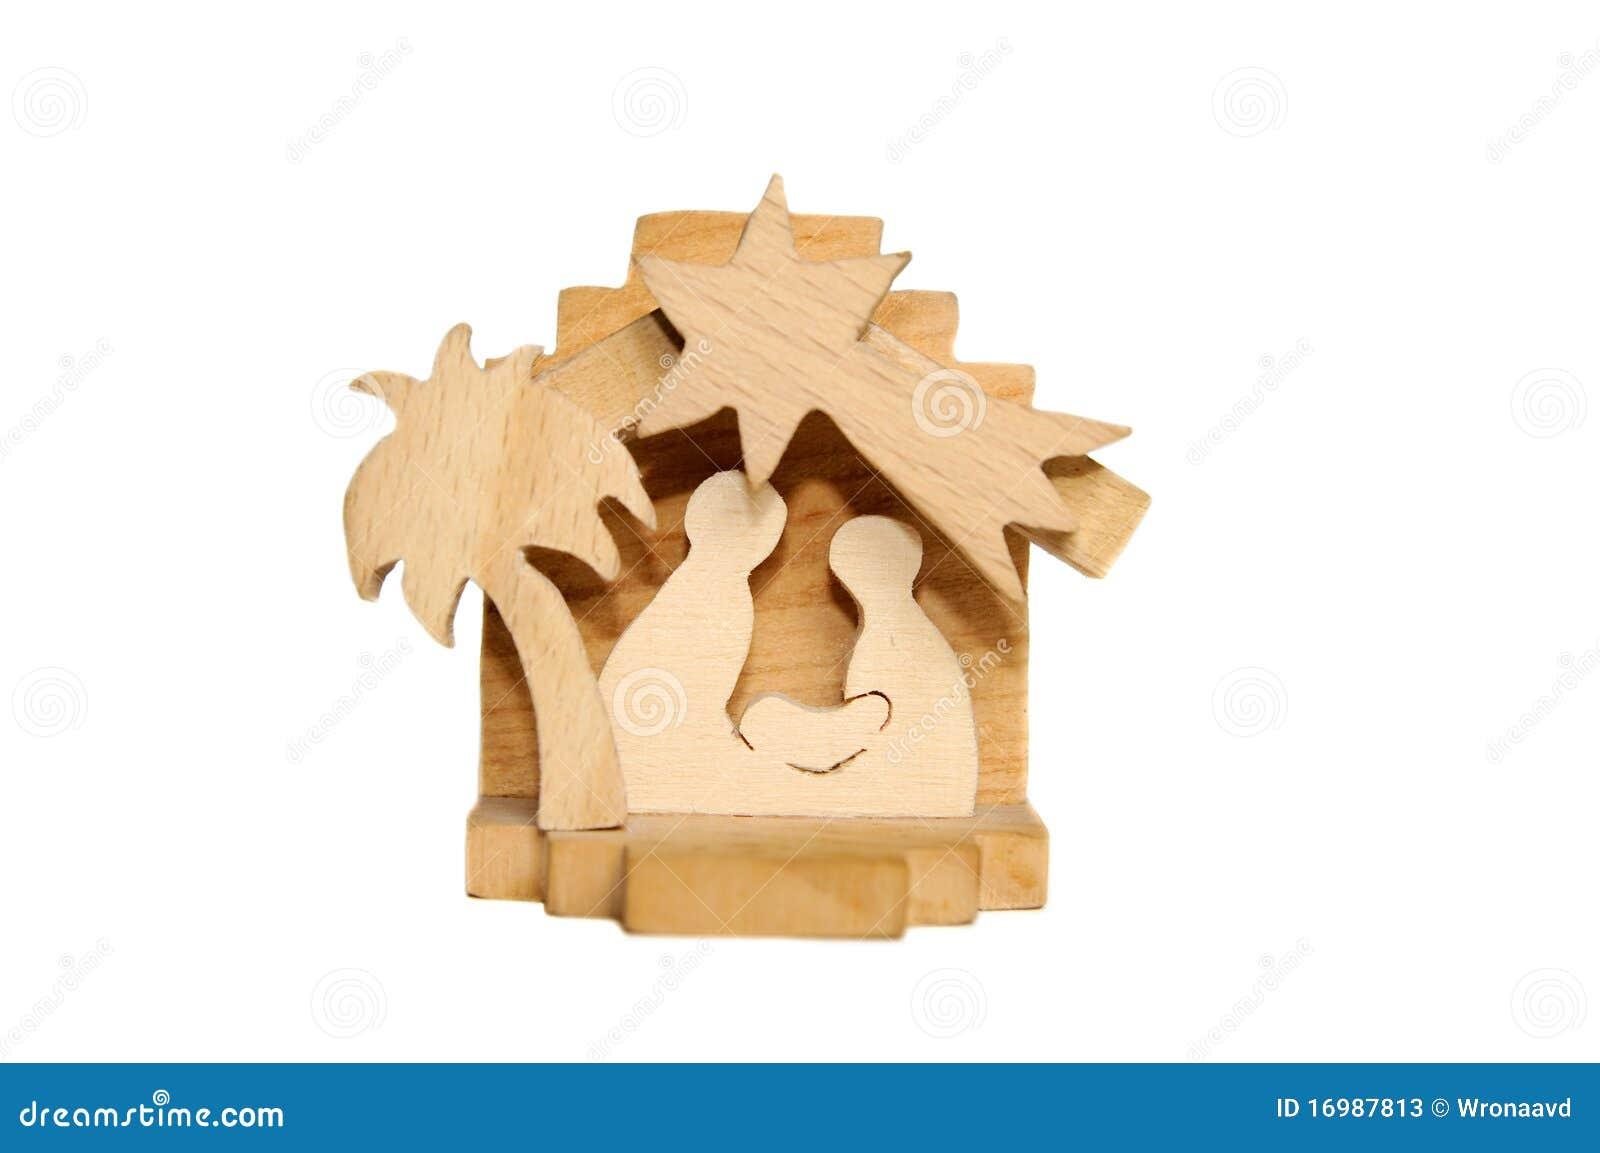 Wooden Christmas crib of Holy Family - Nativity scene isolated on ...